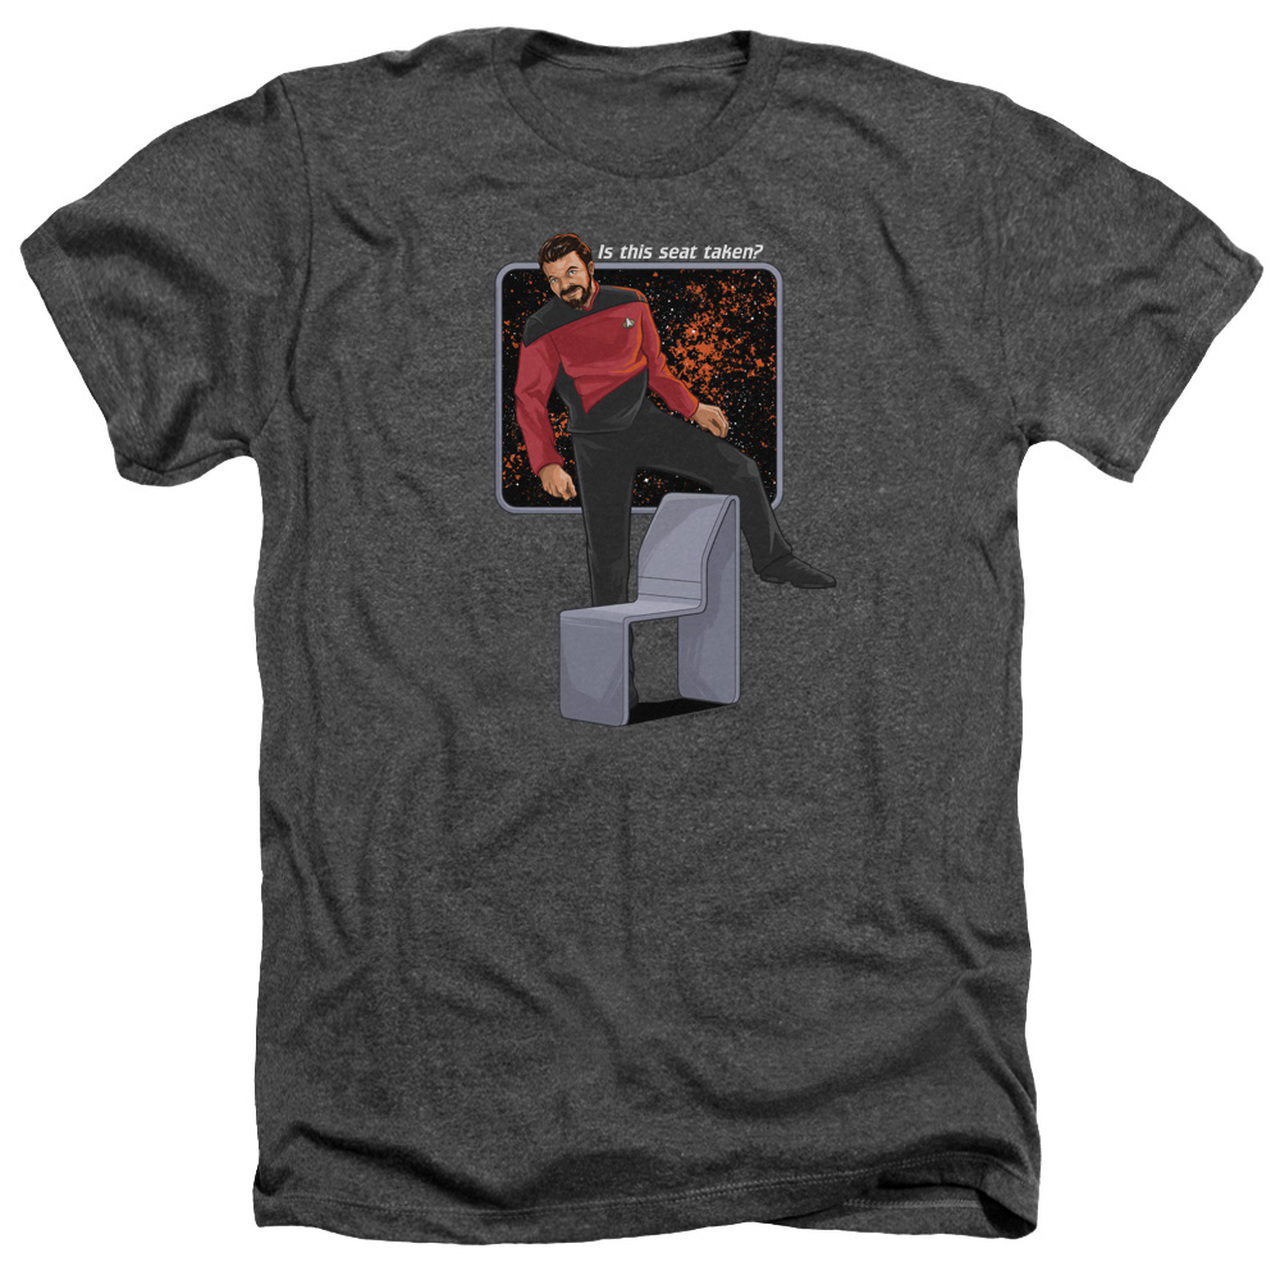 Star Trek Next Generation Picard LOCUTUS OF BORG Heather T-Shirt All Sizes